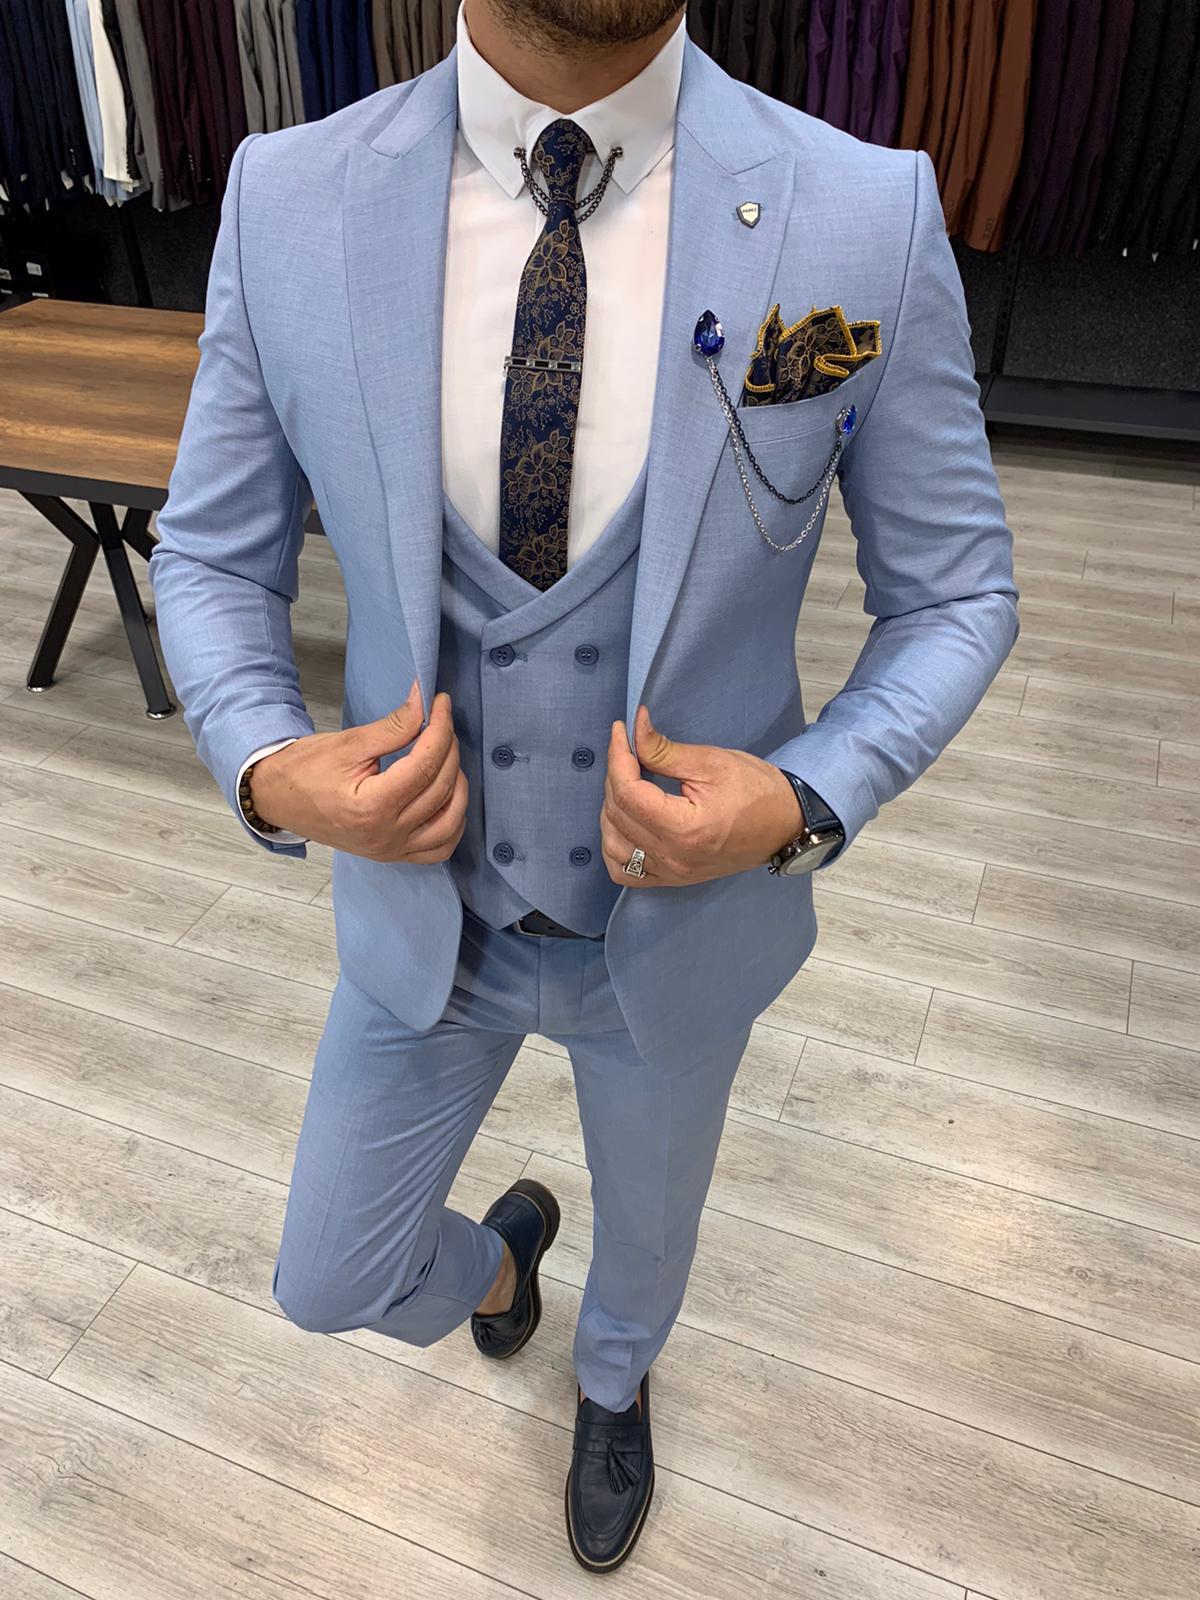 PAREZ Mavi Slim Fit Erkek Takım Elbise